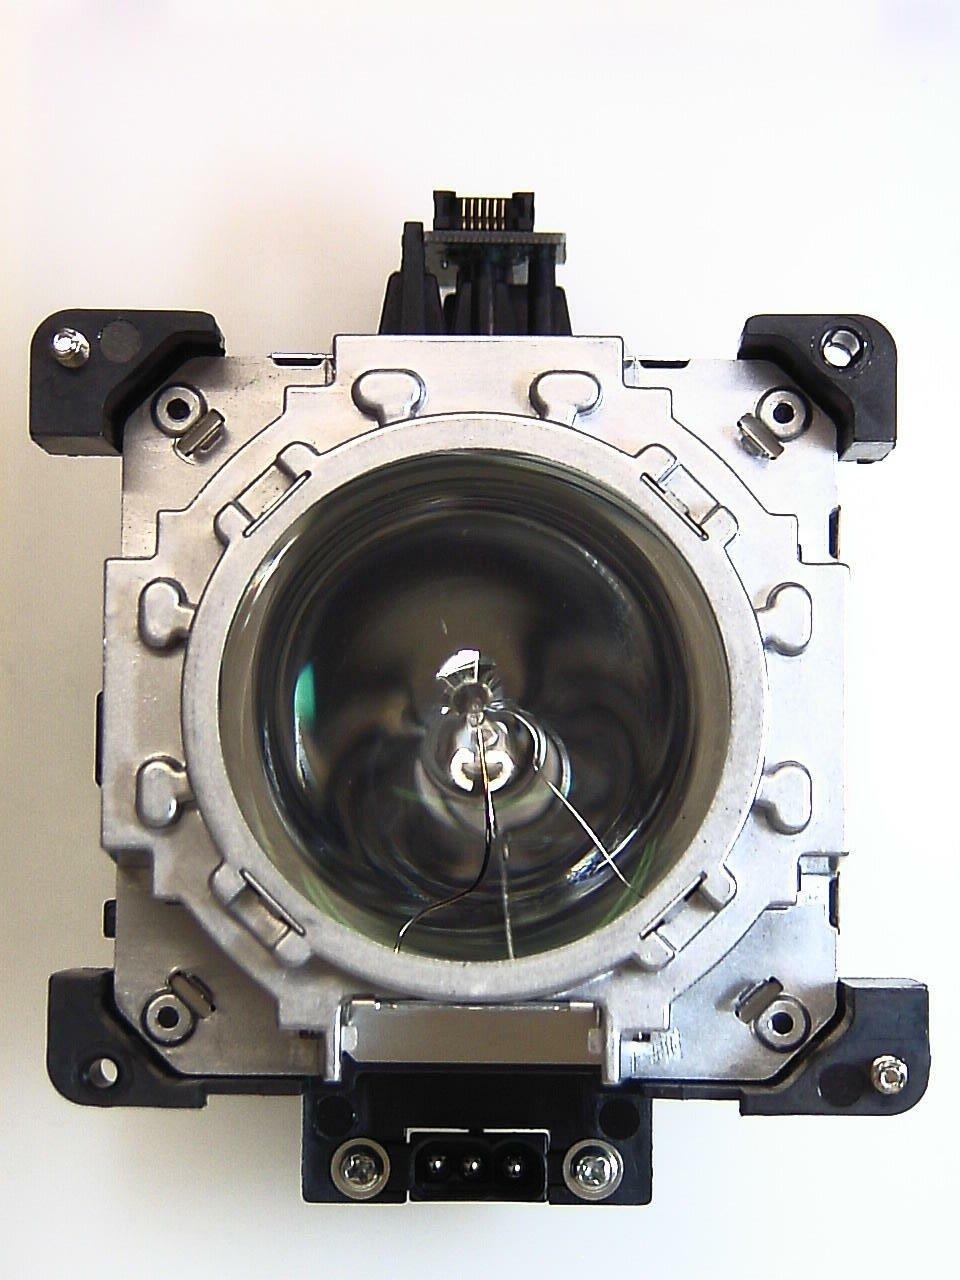 XpertMall Replacement Lamp Housing Eiki AH-57201 Ushio Bulb Inside